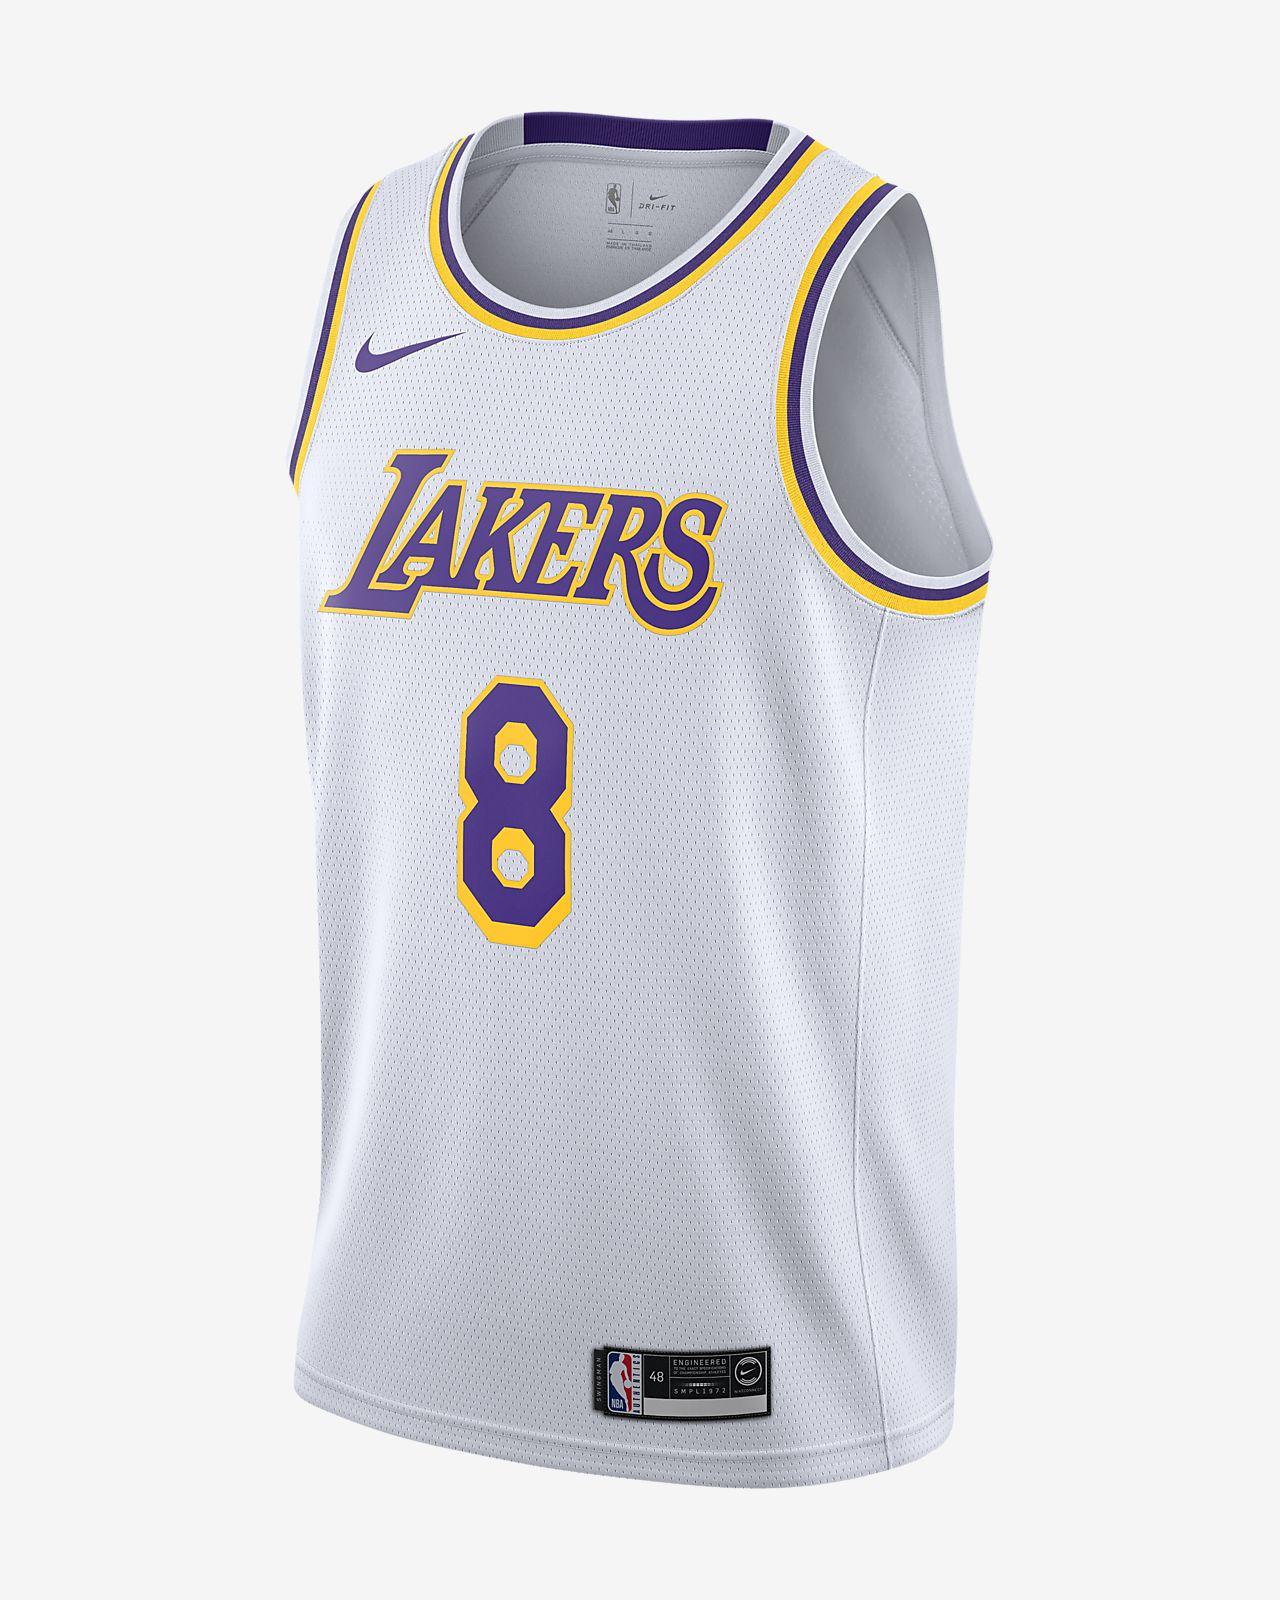 Kobe Bryant Lakers Association Edition Camiseta Nike NBA Swingman